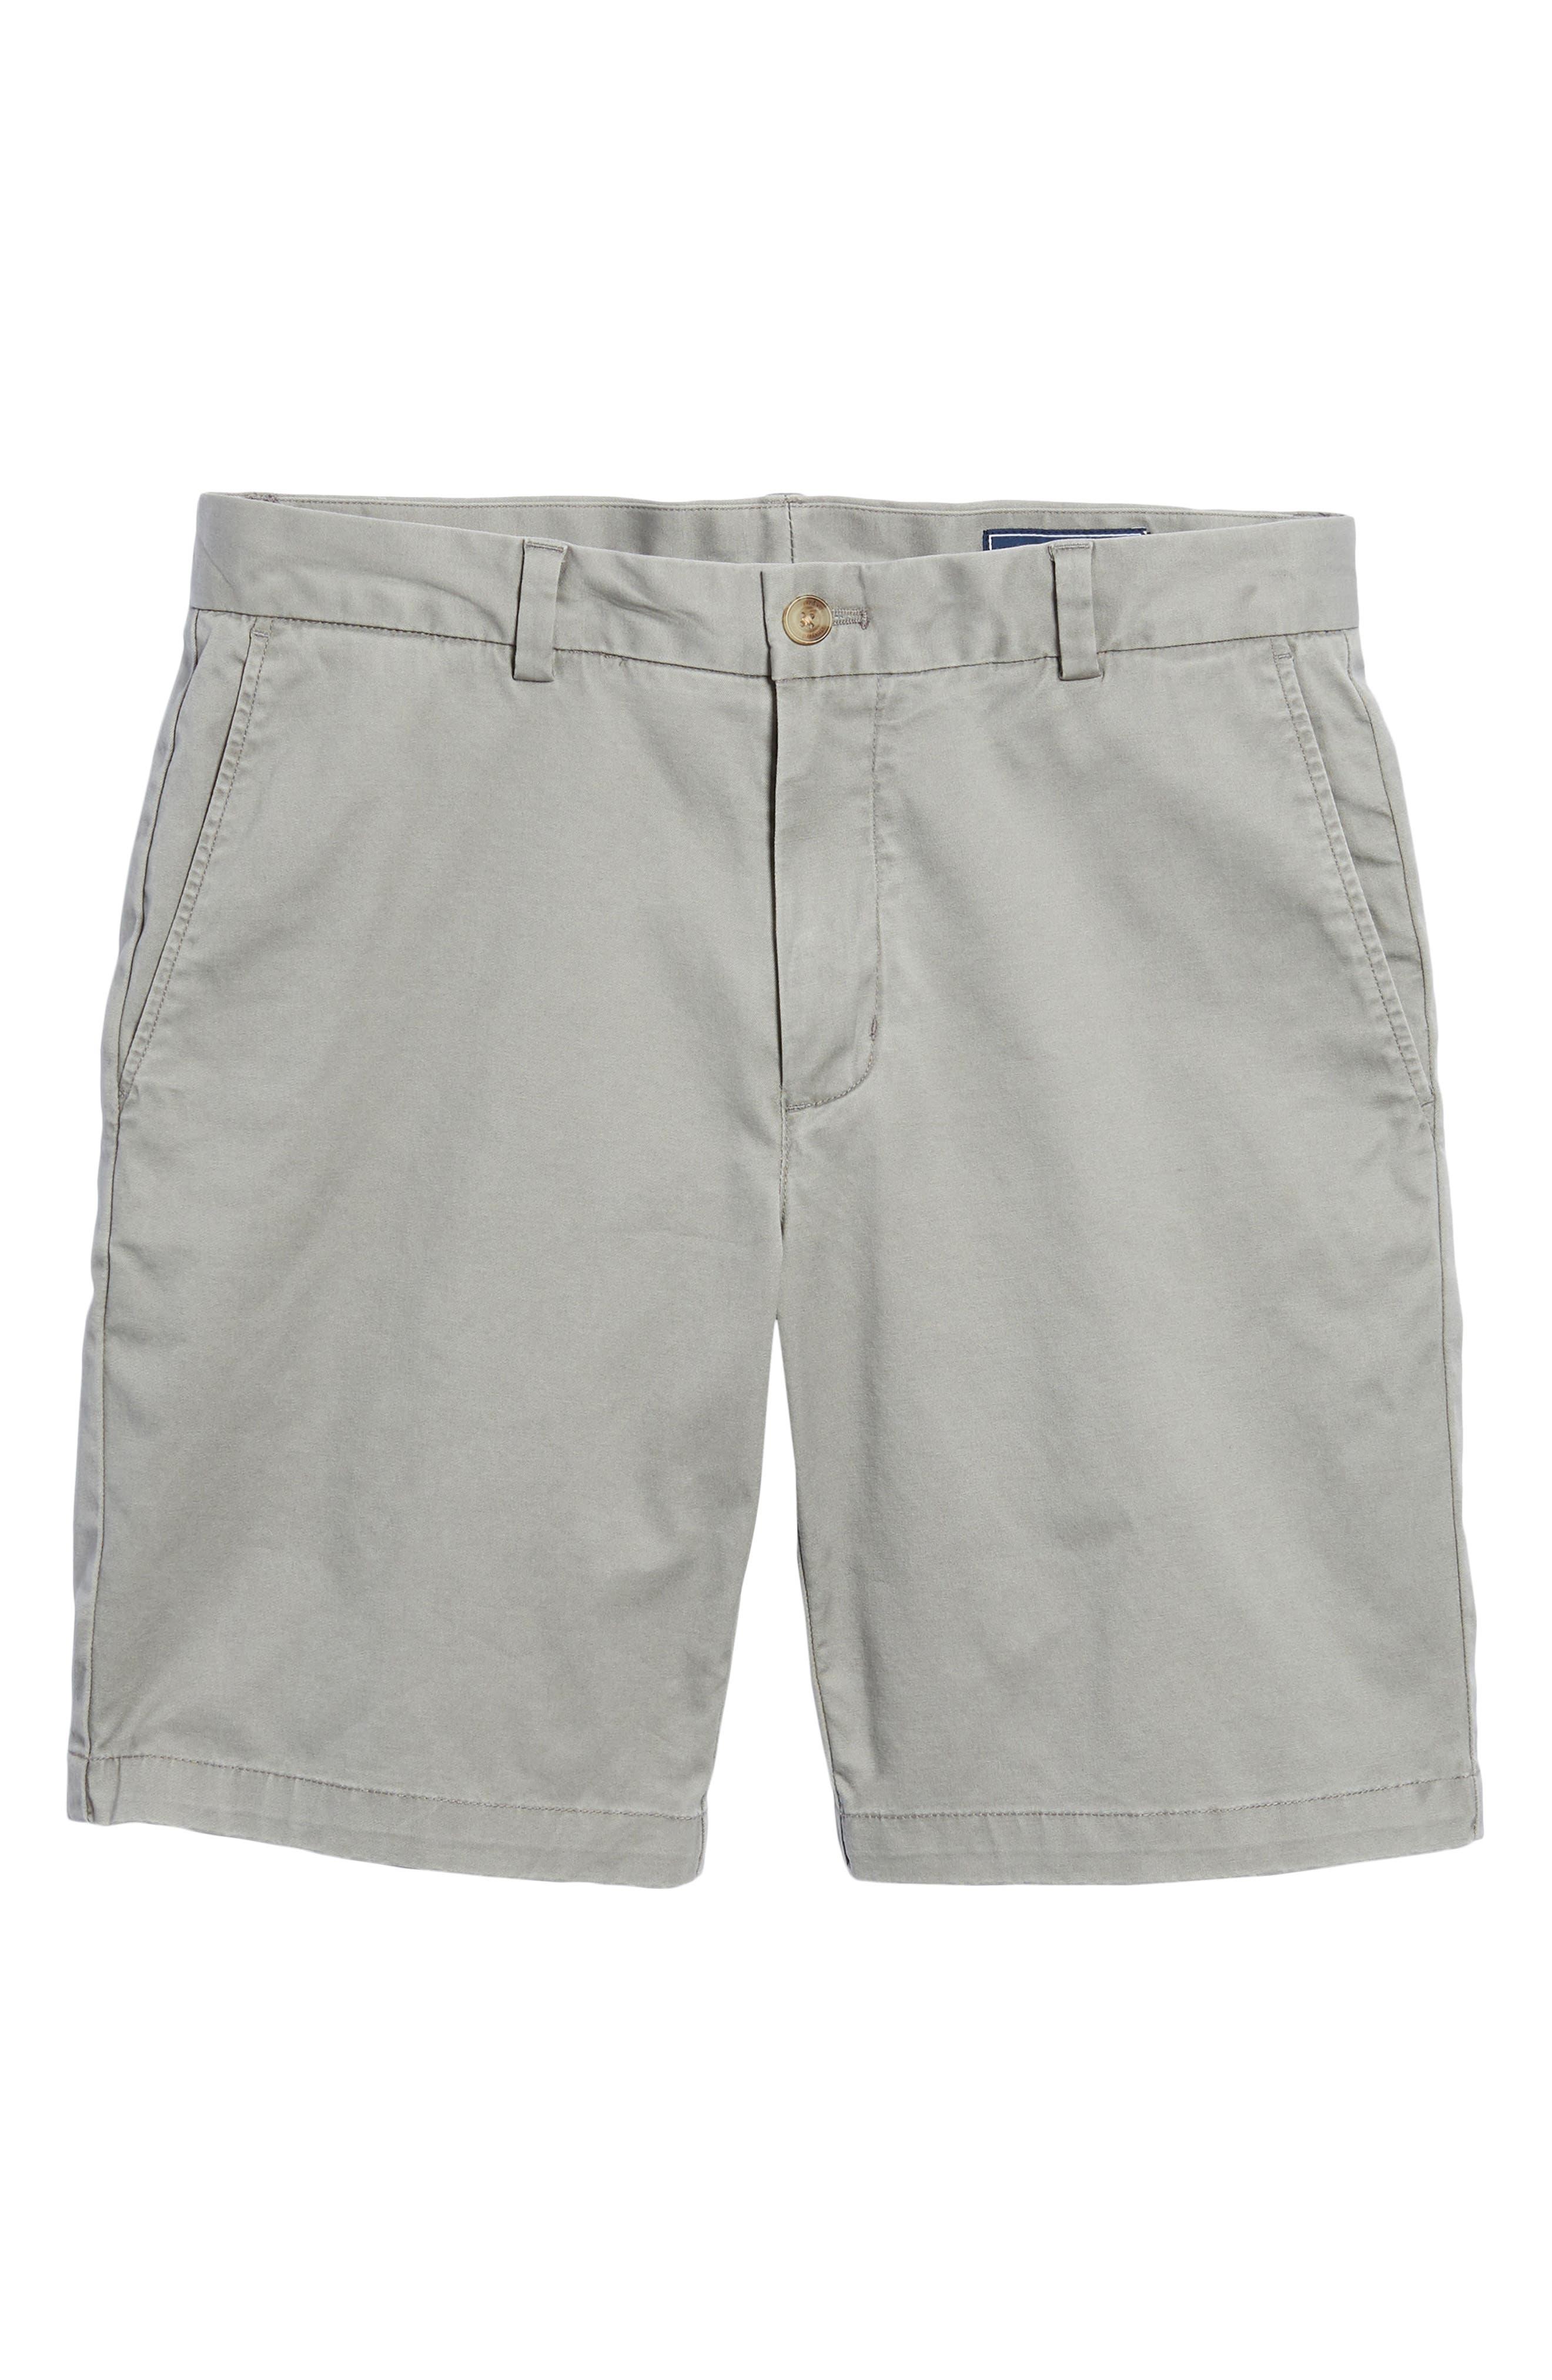 9 Inch Stretch Breaker Shorts,                             Alternate thumbnail 112, color,